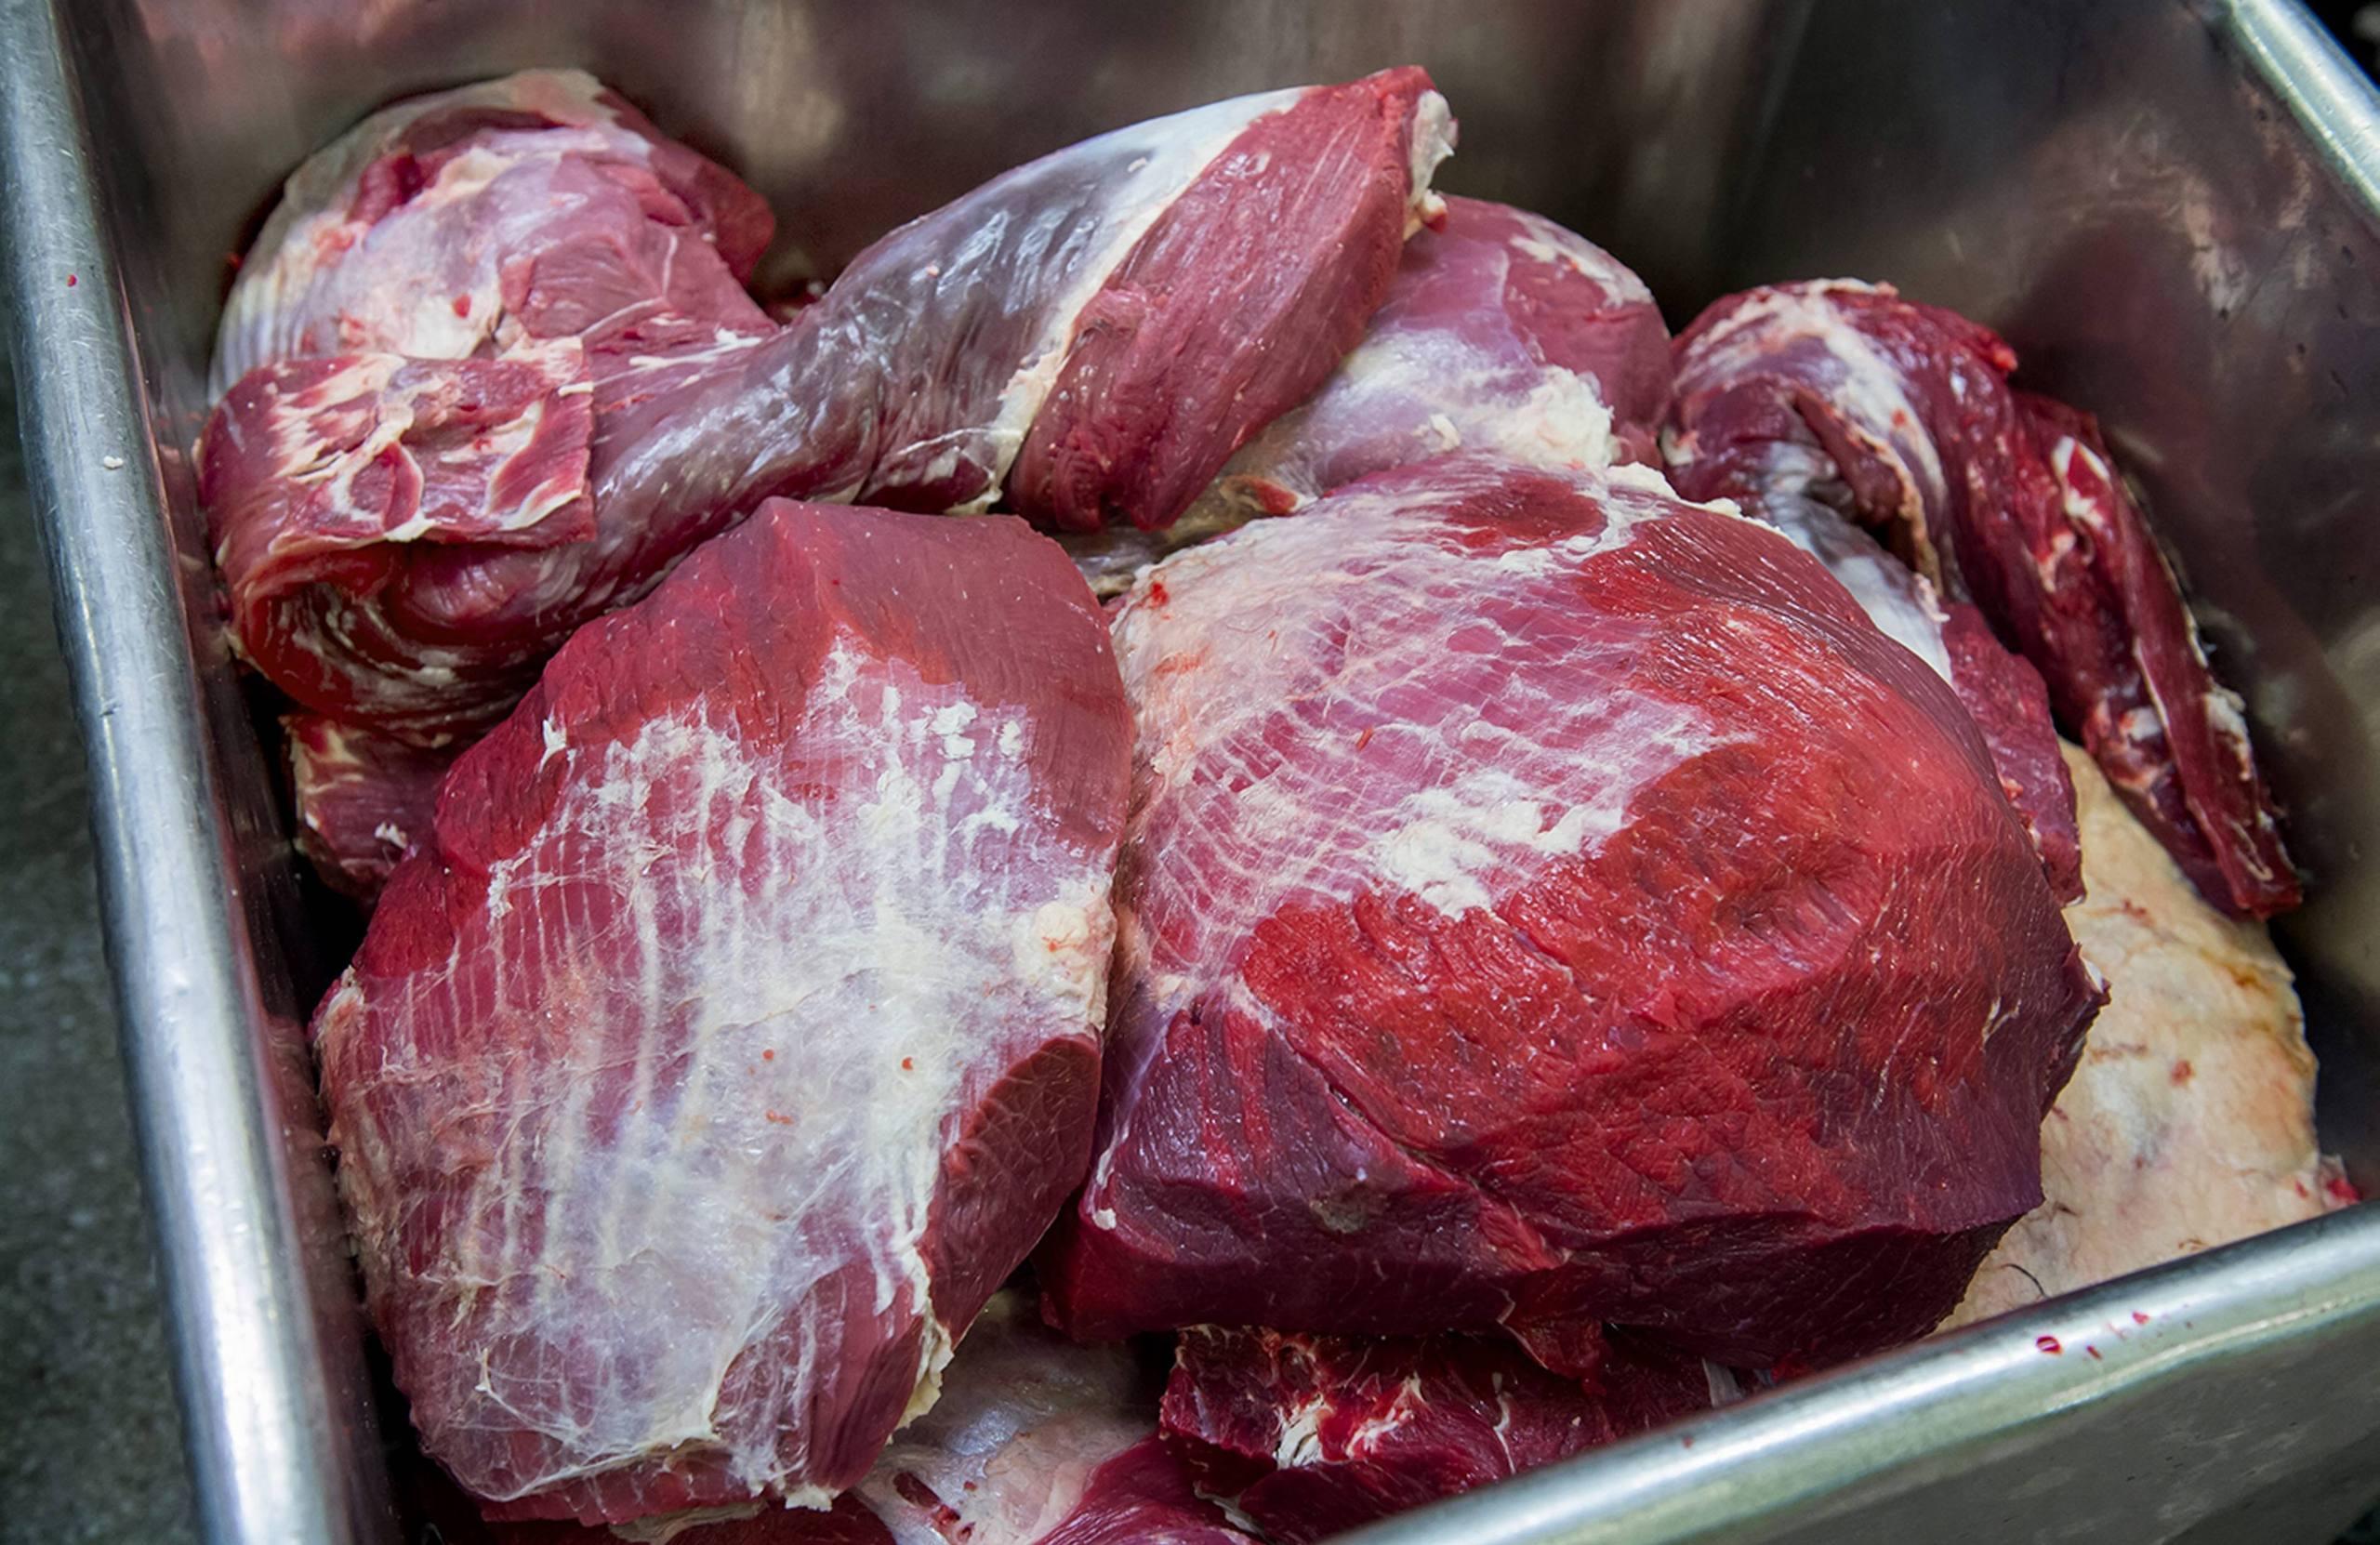 halal kött djurplågeri